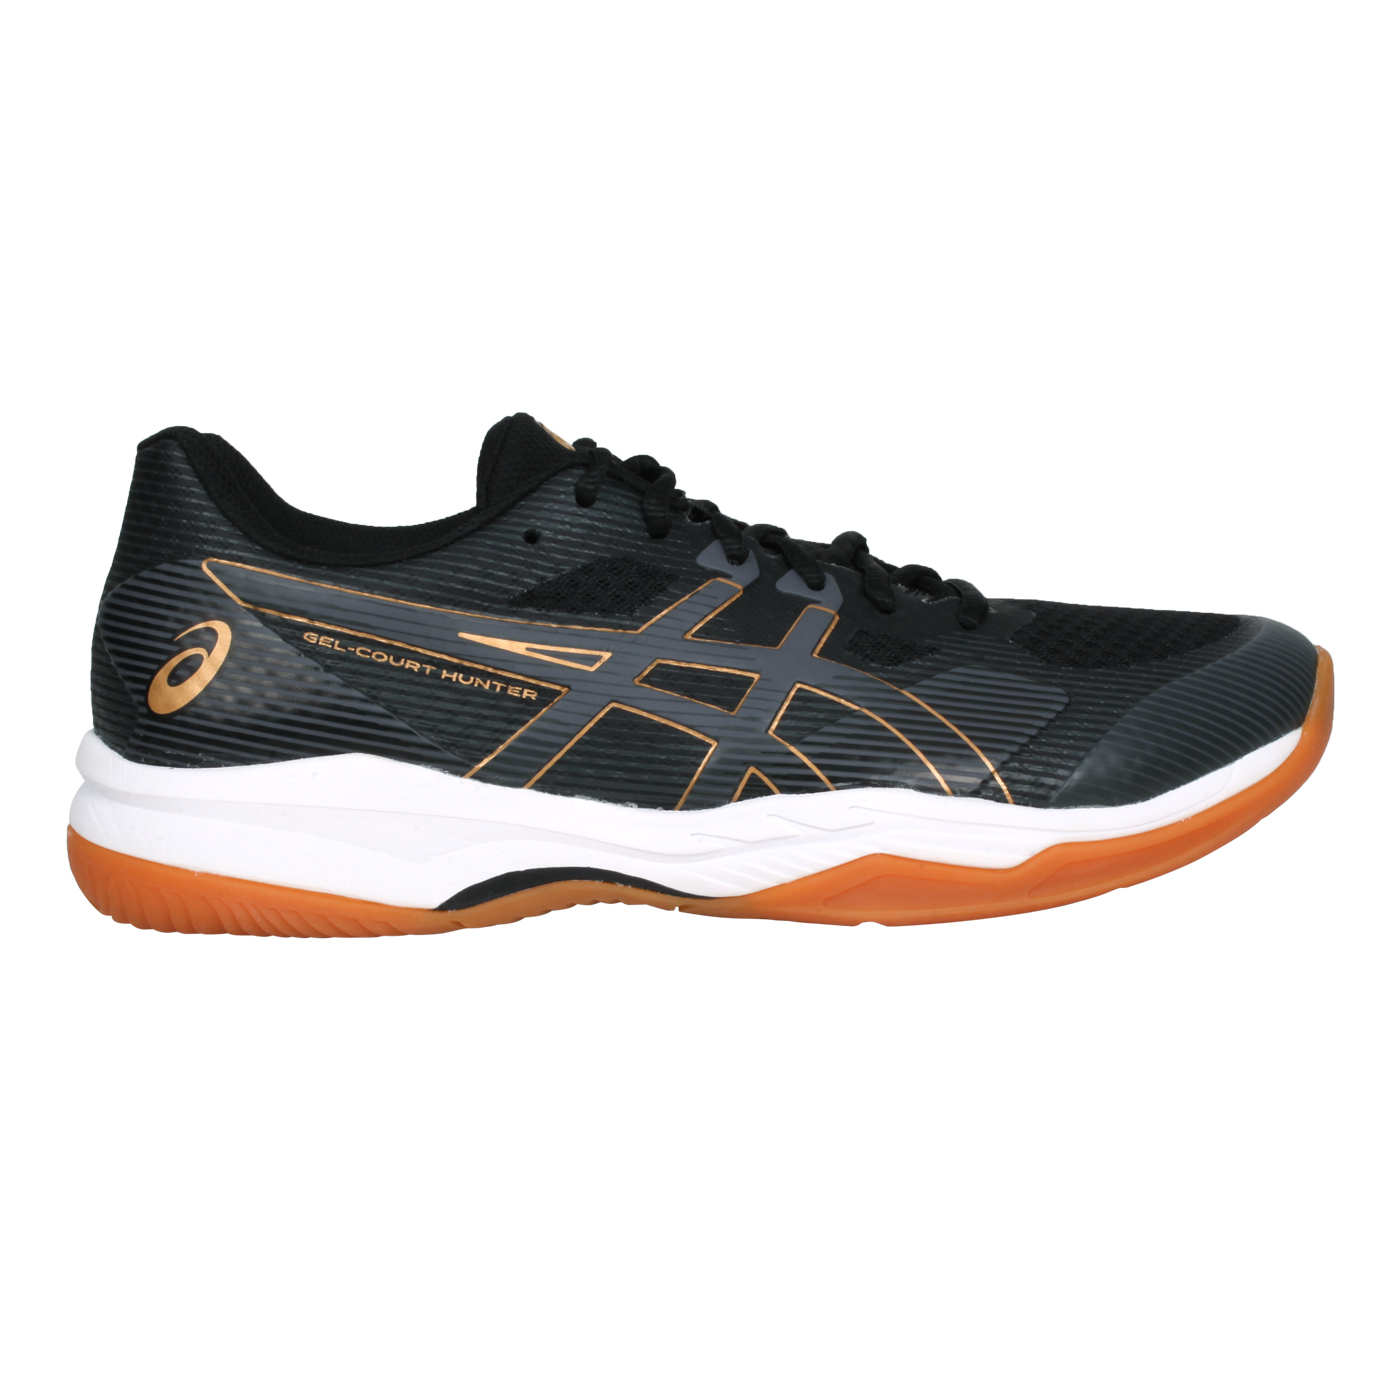 ASICS 男款羽球鞋   @GEL-COURT HUNTER 2@1071A059-001 - 黑灰金